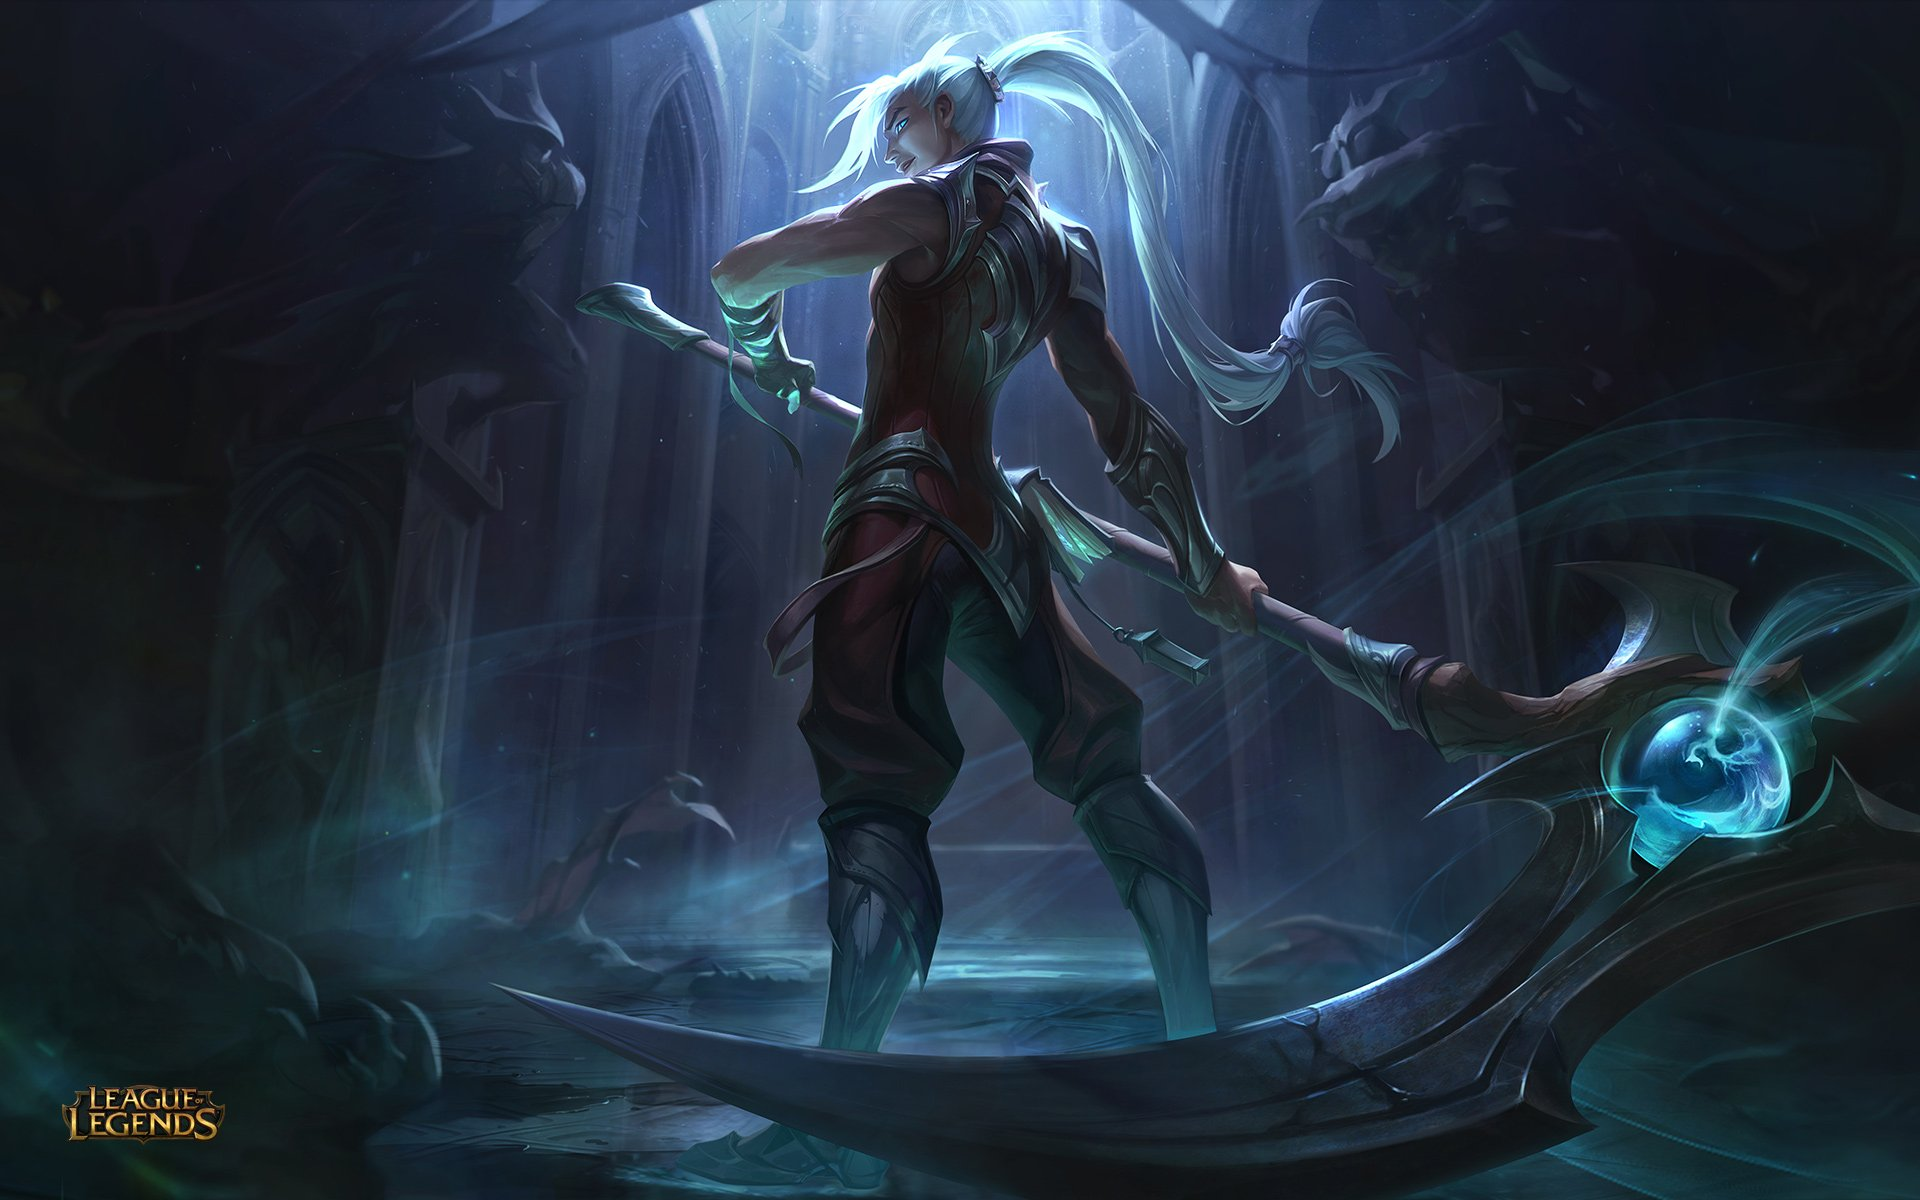 League Of Legends Wallpapers Das Splash Arts Dos Guardioes Das